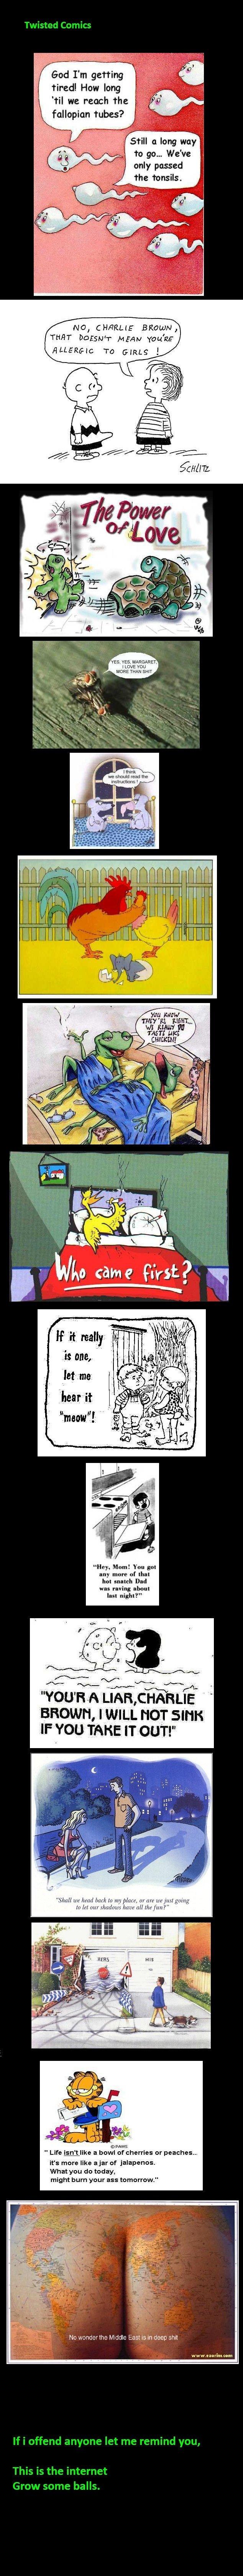 Funny cartoons seks opa Gay blowjob